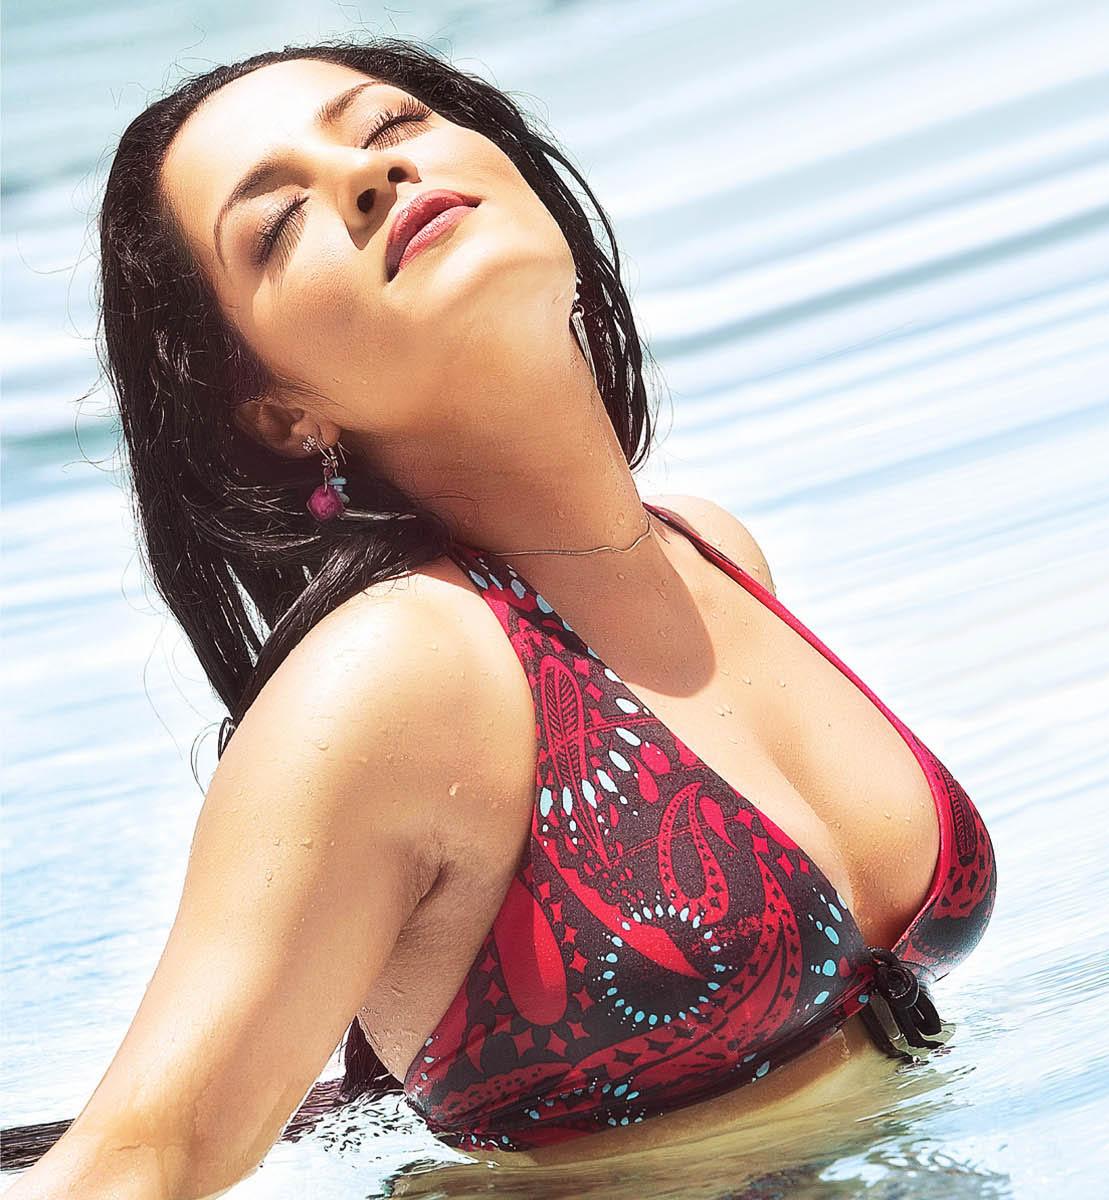 http://3.bp.blogspot.com/_eX5xKWfsiuo/S5IOLAC2uVI/AAAAAAAABYc/NzL7bDuZl9U/s1600/Celine_Jaitley_super_Pics_Pictures_Psuperos_Wallpapers_Psuperoshoot_Sizzling_Bold_Spicy_Bikini_wow_Babe_Bollywood_Actress_Latest_super_News_Gossips_Events_Samachar_Khabar_Box_Office_2010.jpg